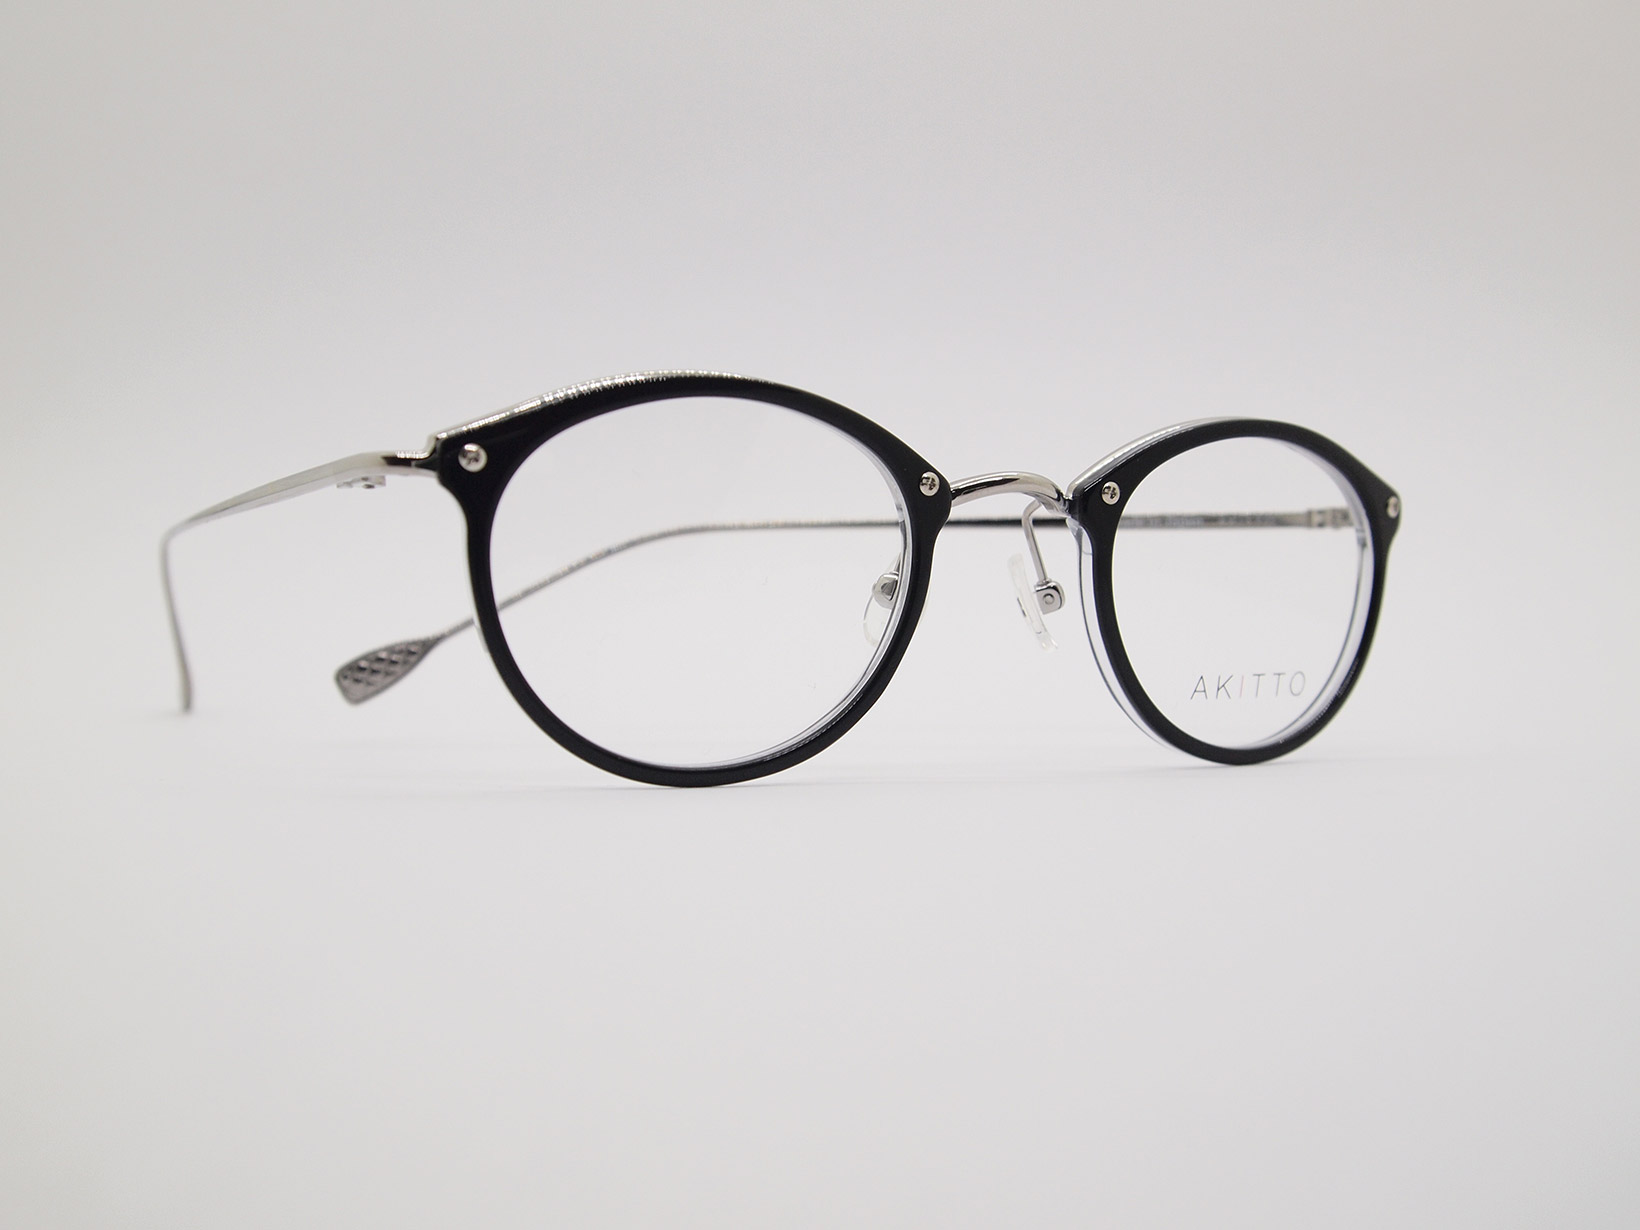 AKITTO 2021-3rd bin2 color|BK size:43□24 material:titanium+acetate price:¥46,200-(税込み)